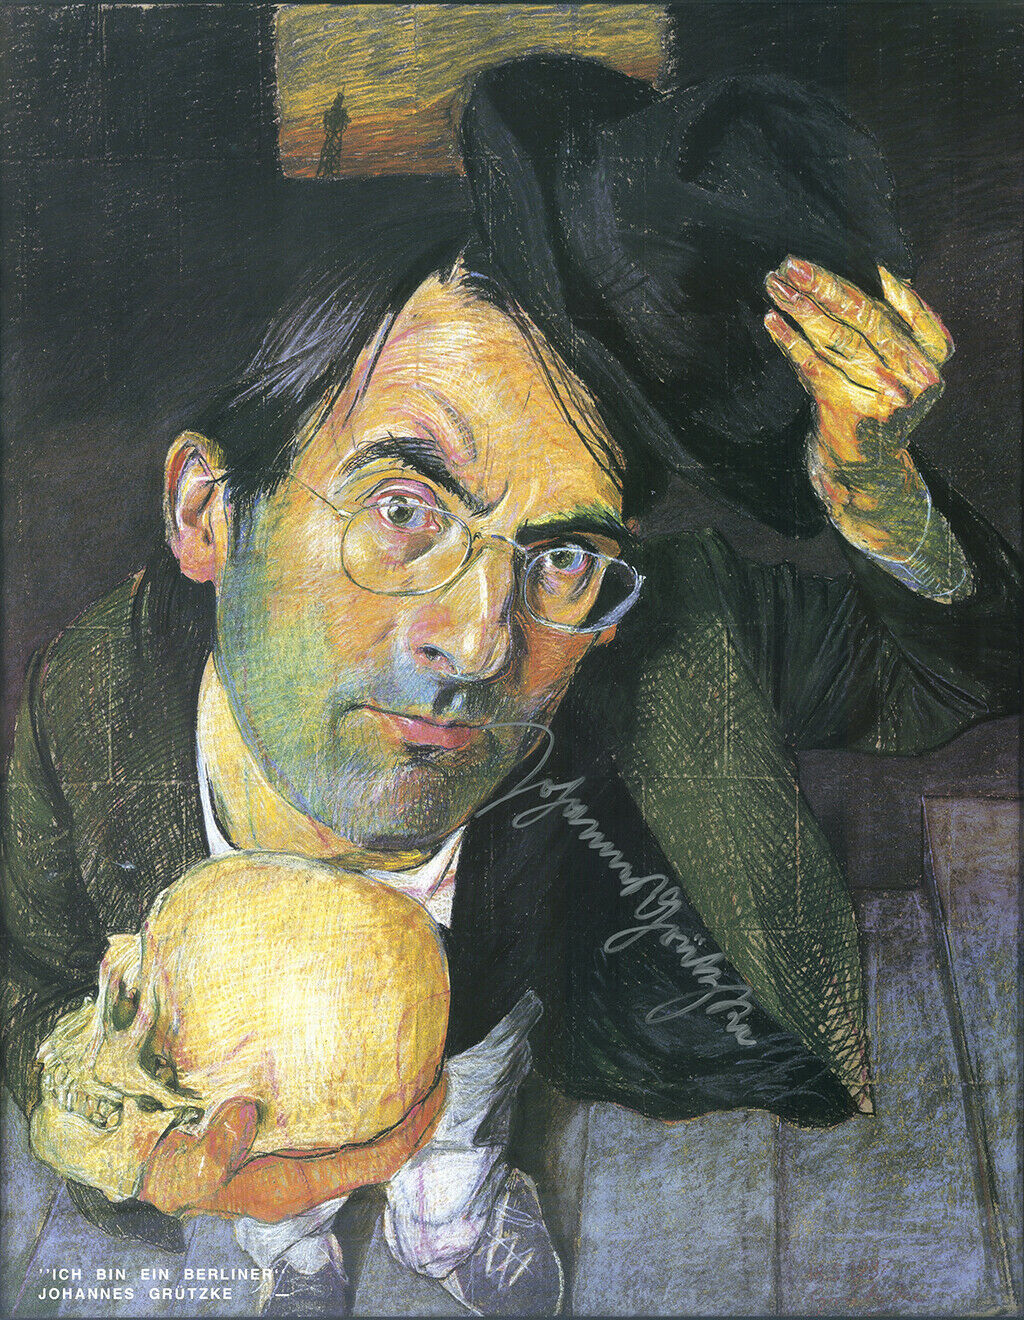 Galerie Christoph Bauer Hanau